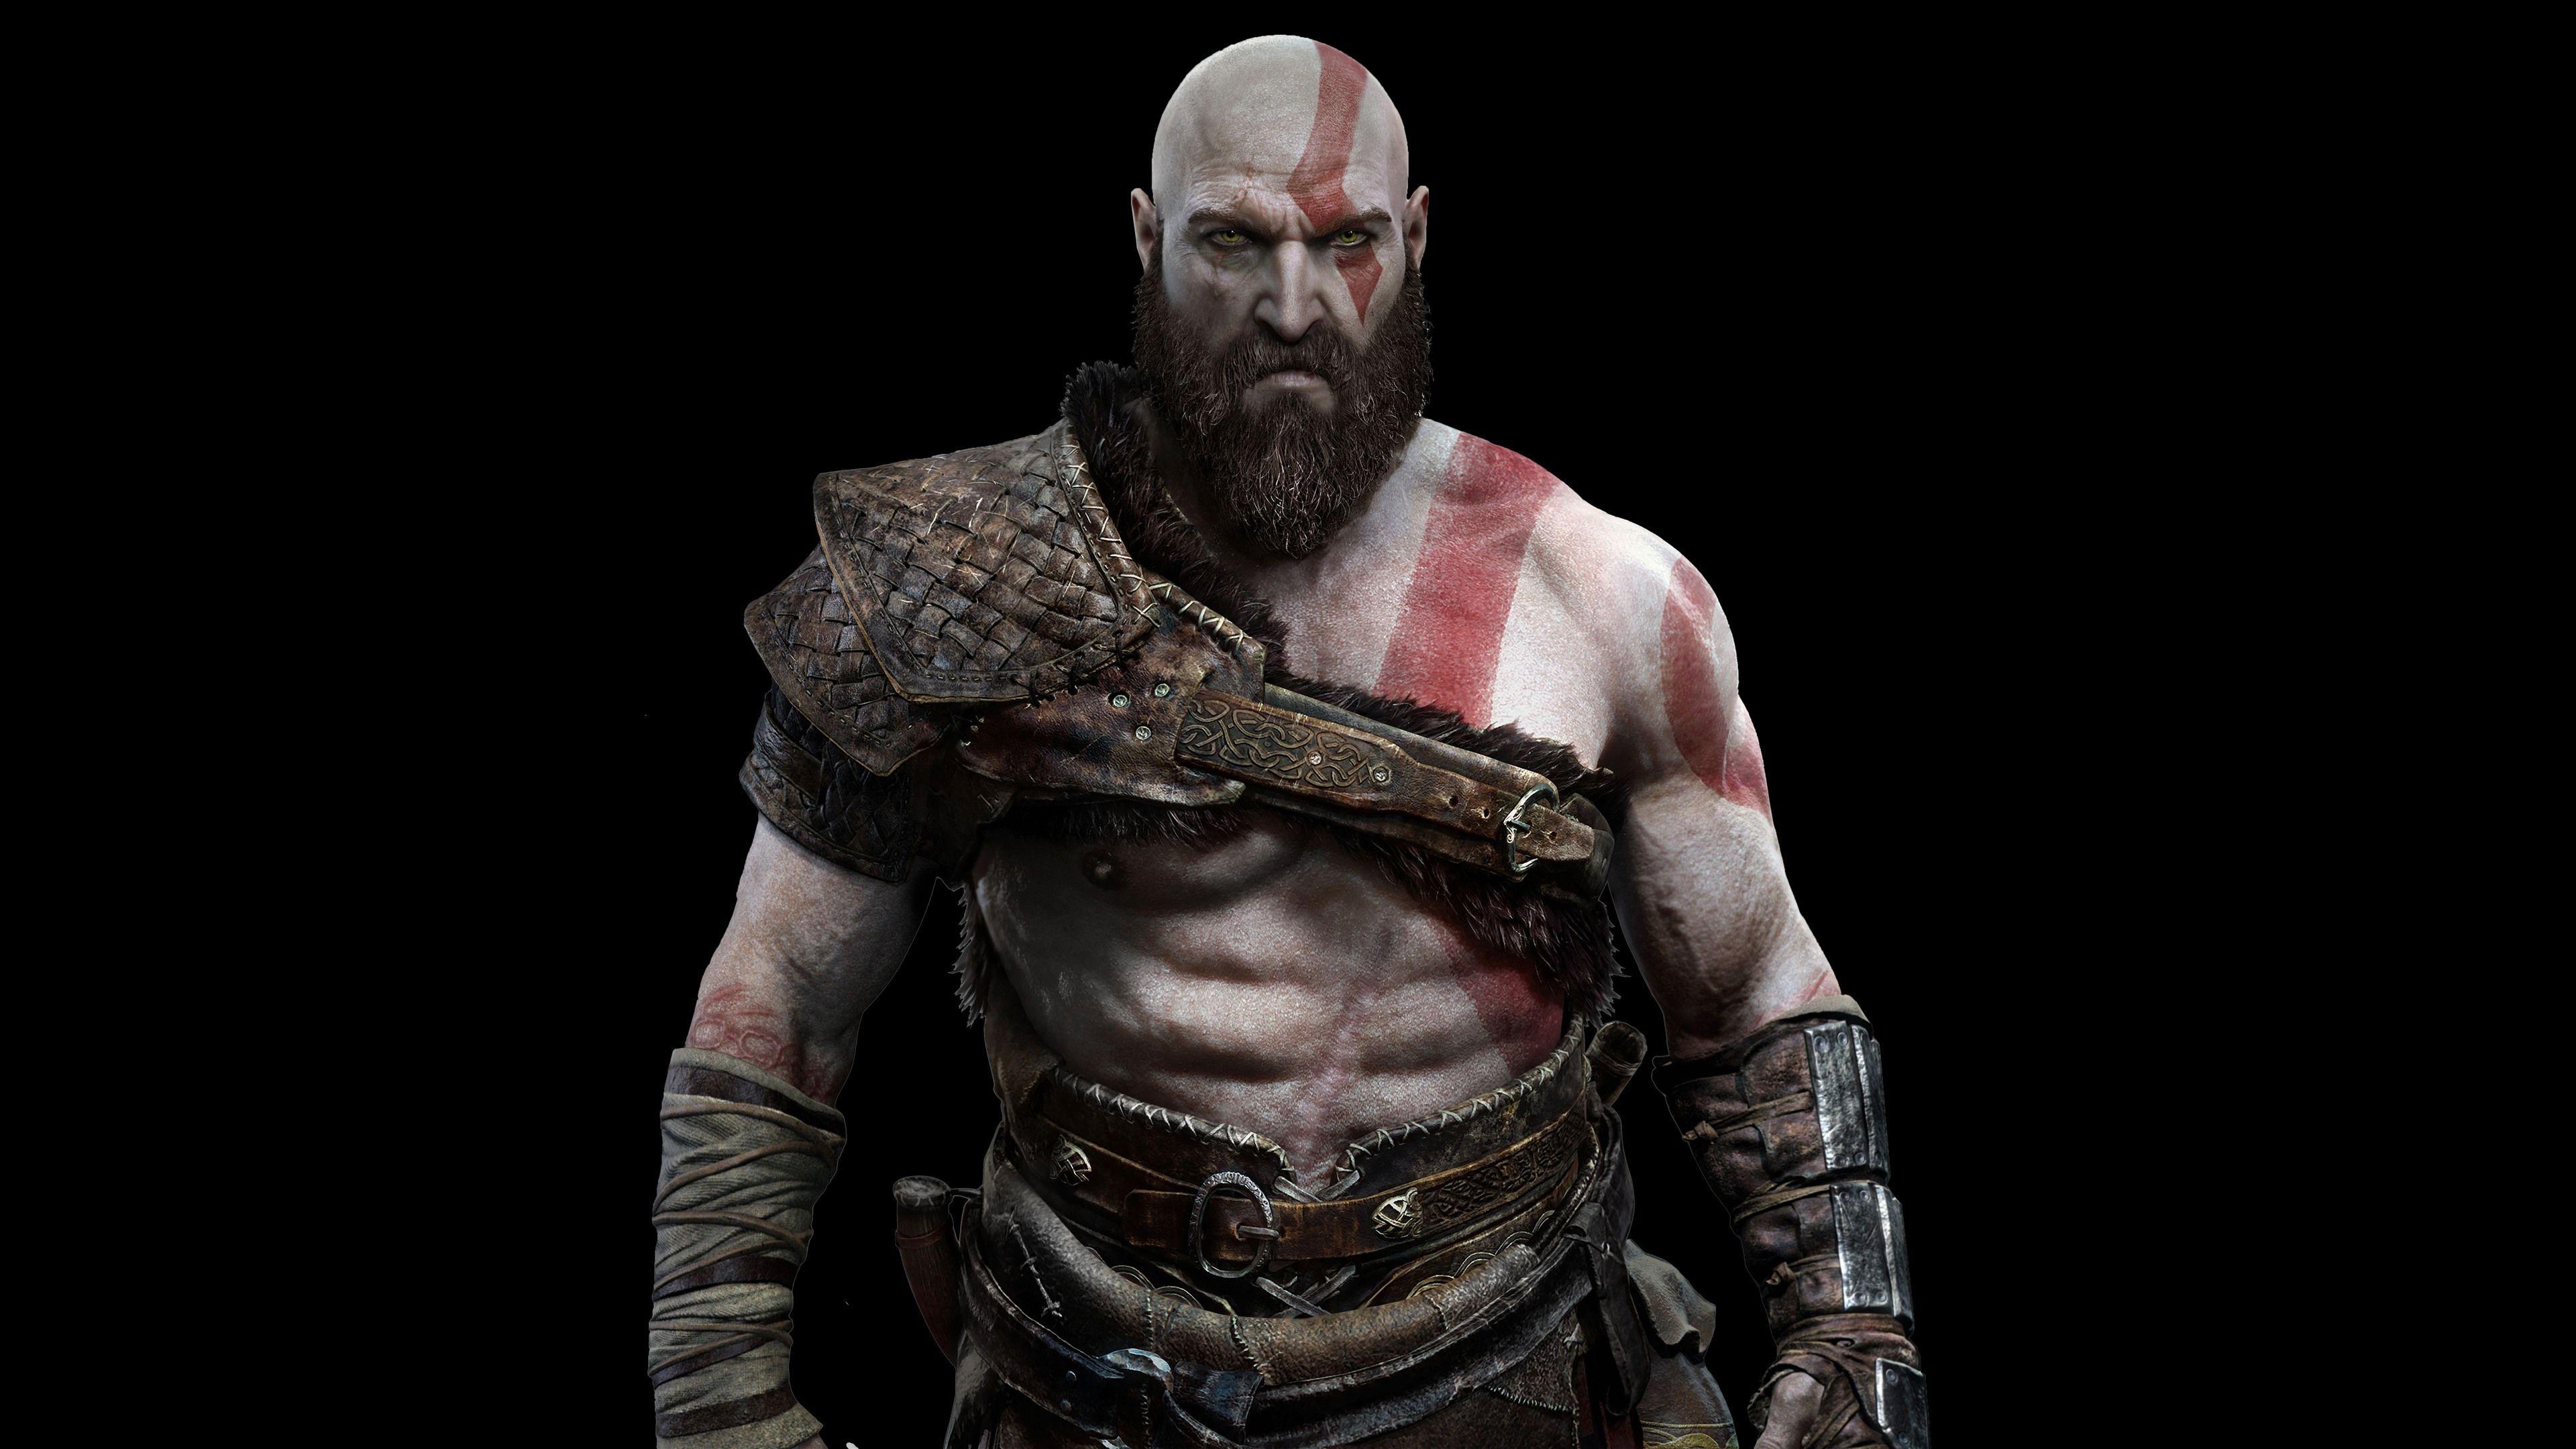 43 Bodybuilding Wallpapers Hd Creative Bodybuilding Bodybuilder Wallpaper Hd Is Amazing Hd Wallpapers For God Of War Kratos God Of War Amazing Hd Wallpapers